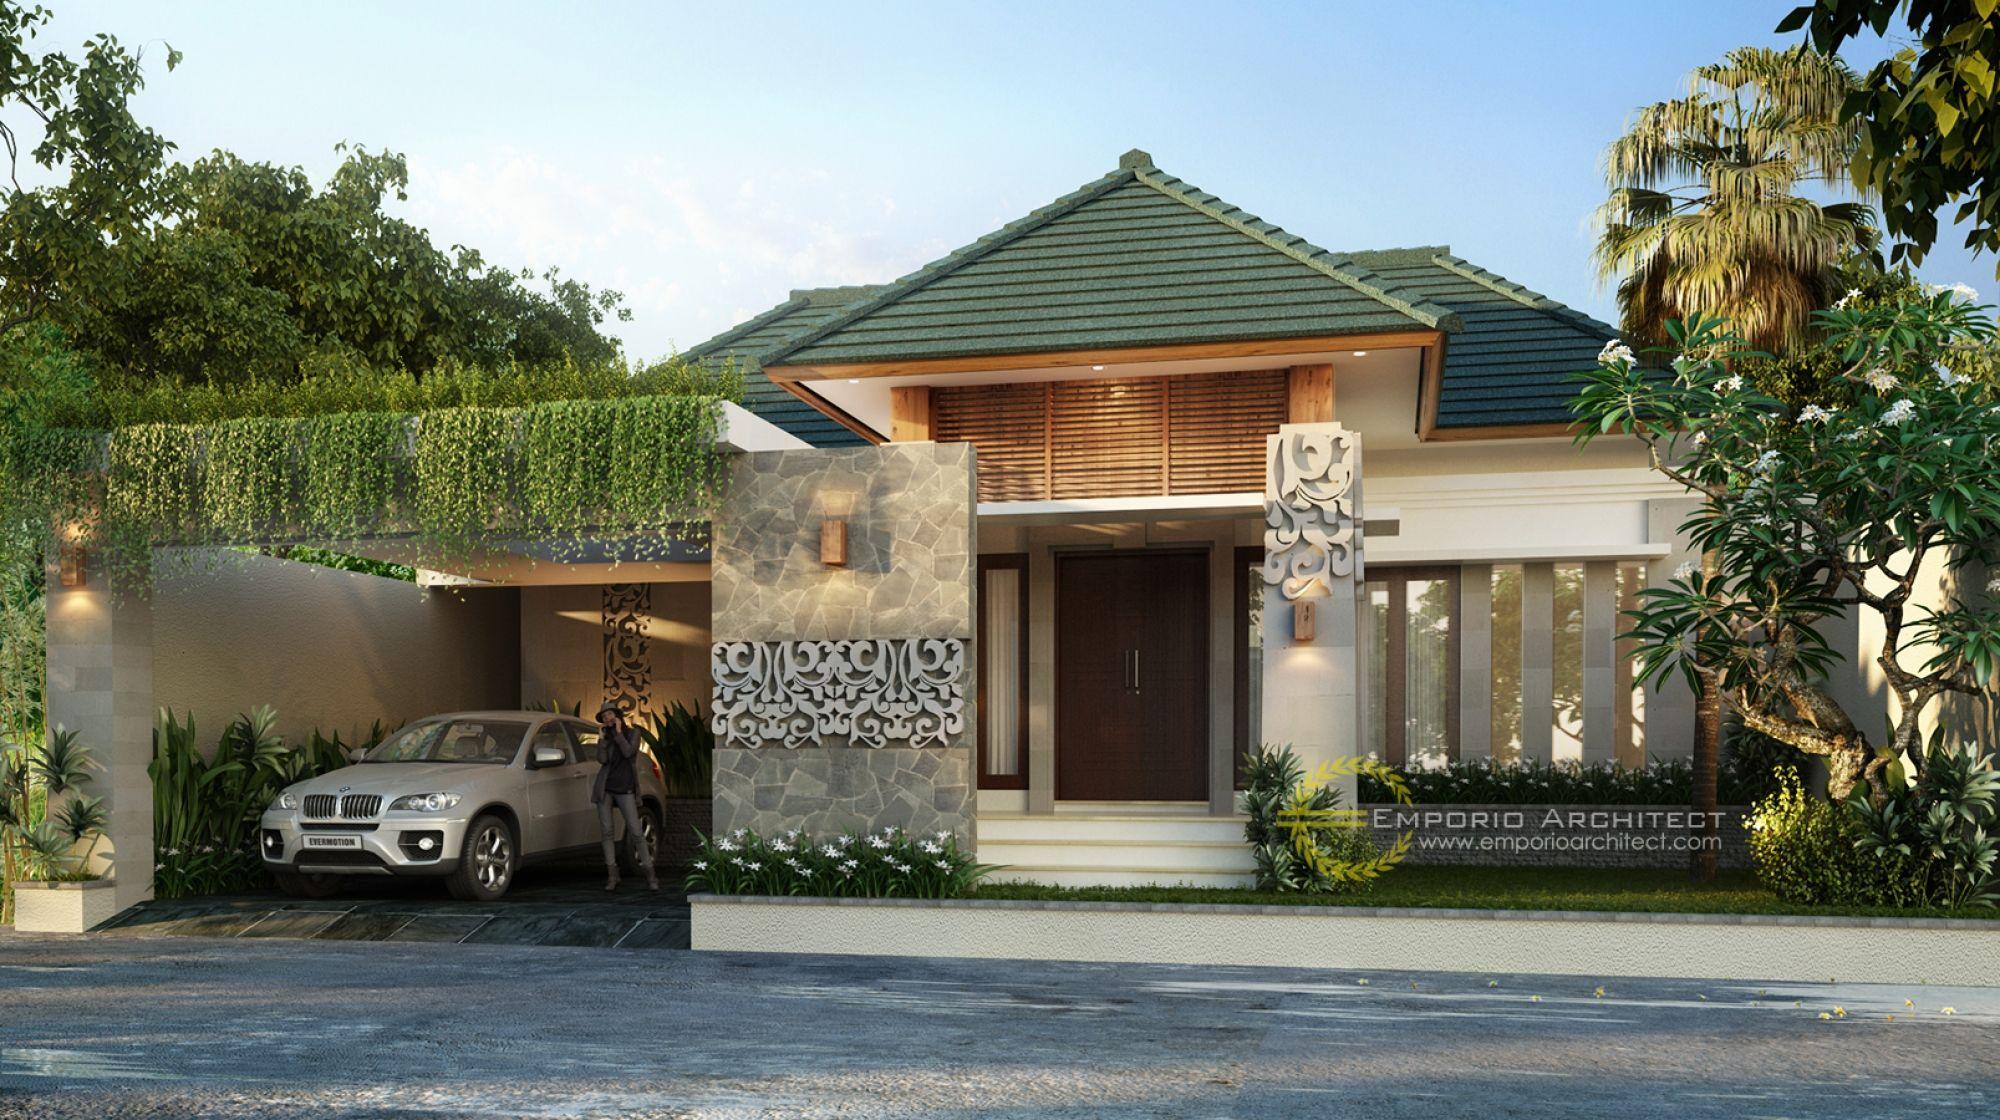 Jasa Arsitek Desain Rumah Bapak Ilham Jasa